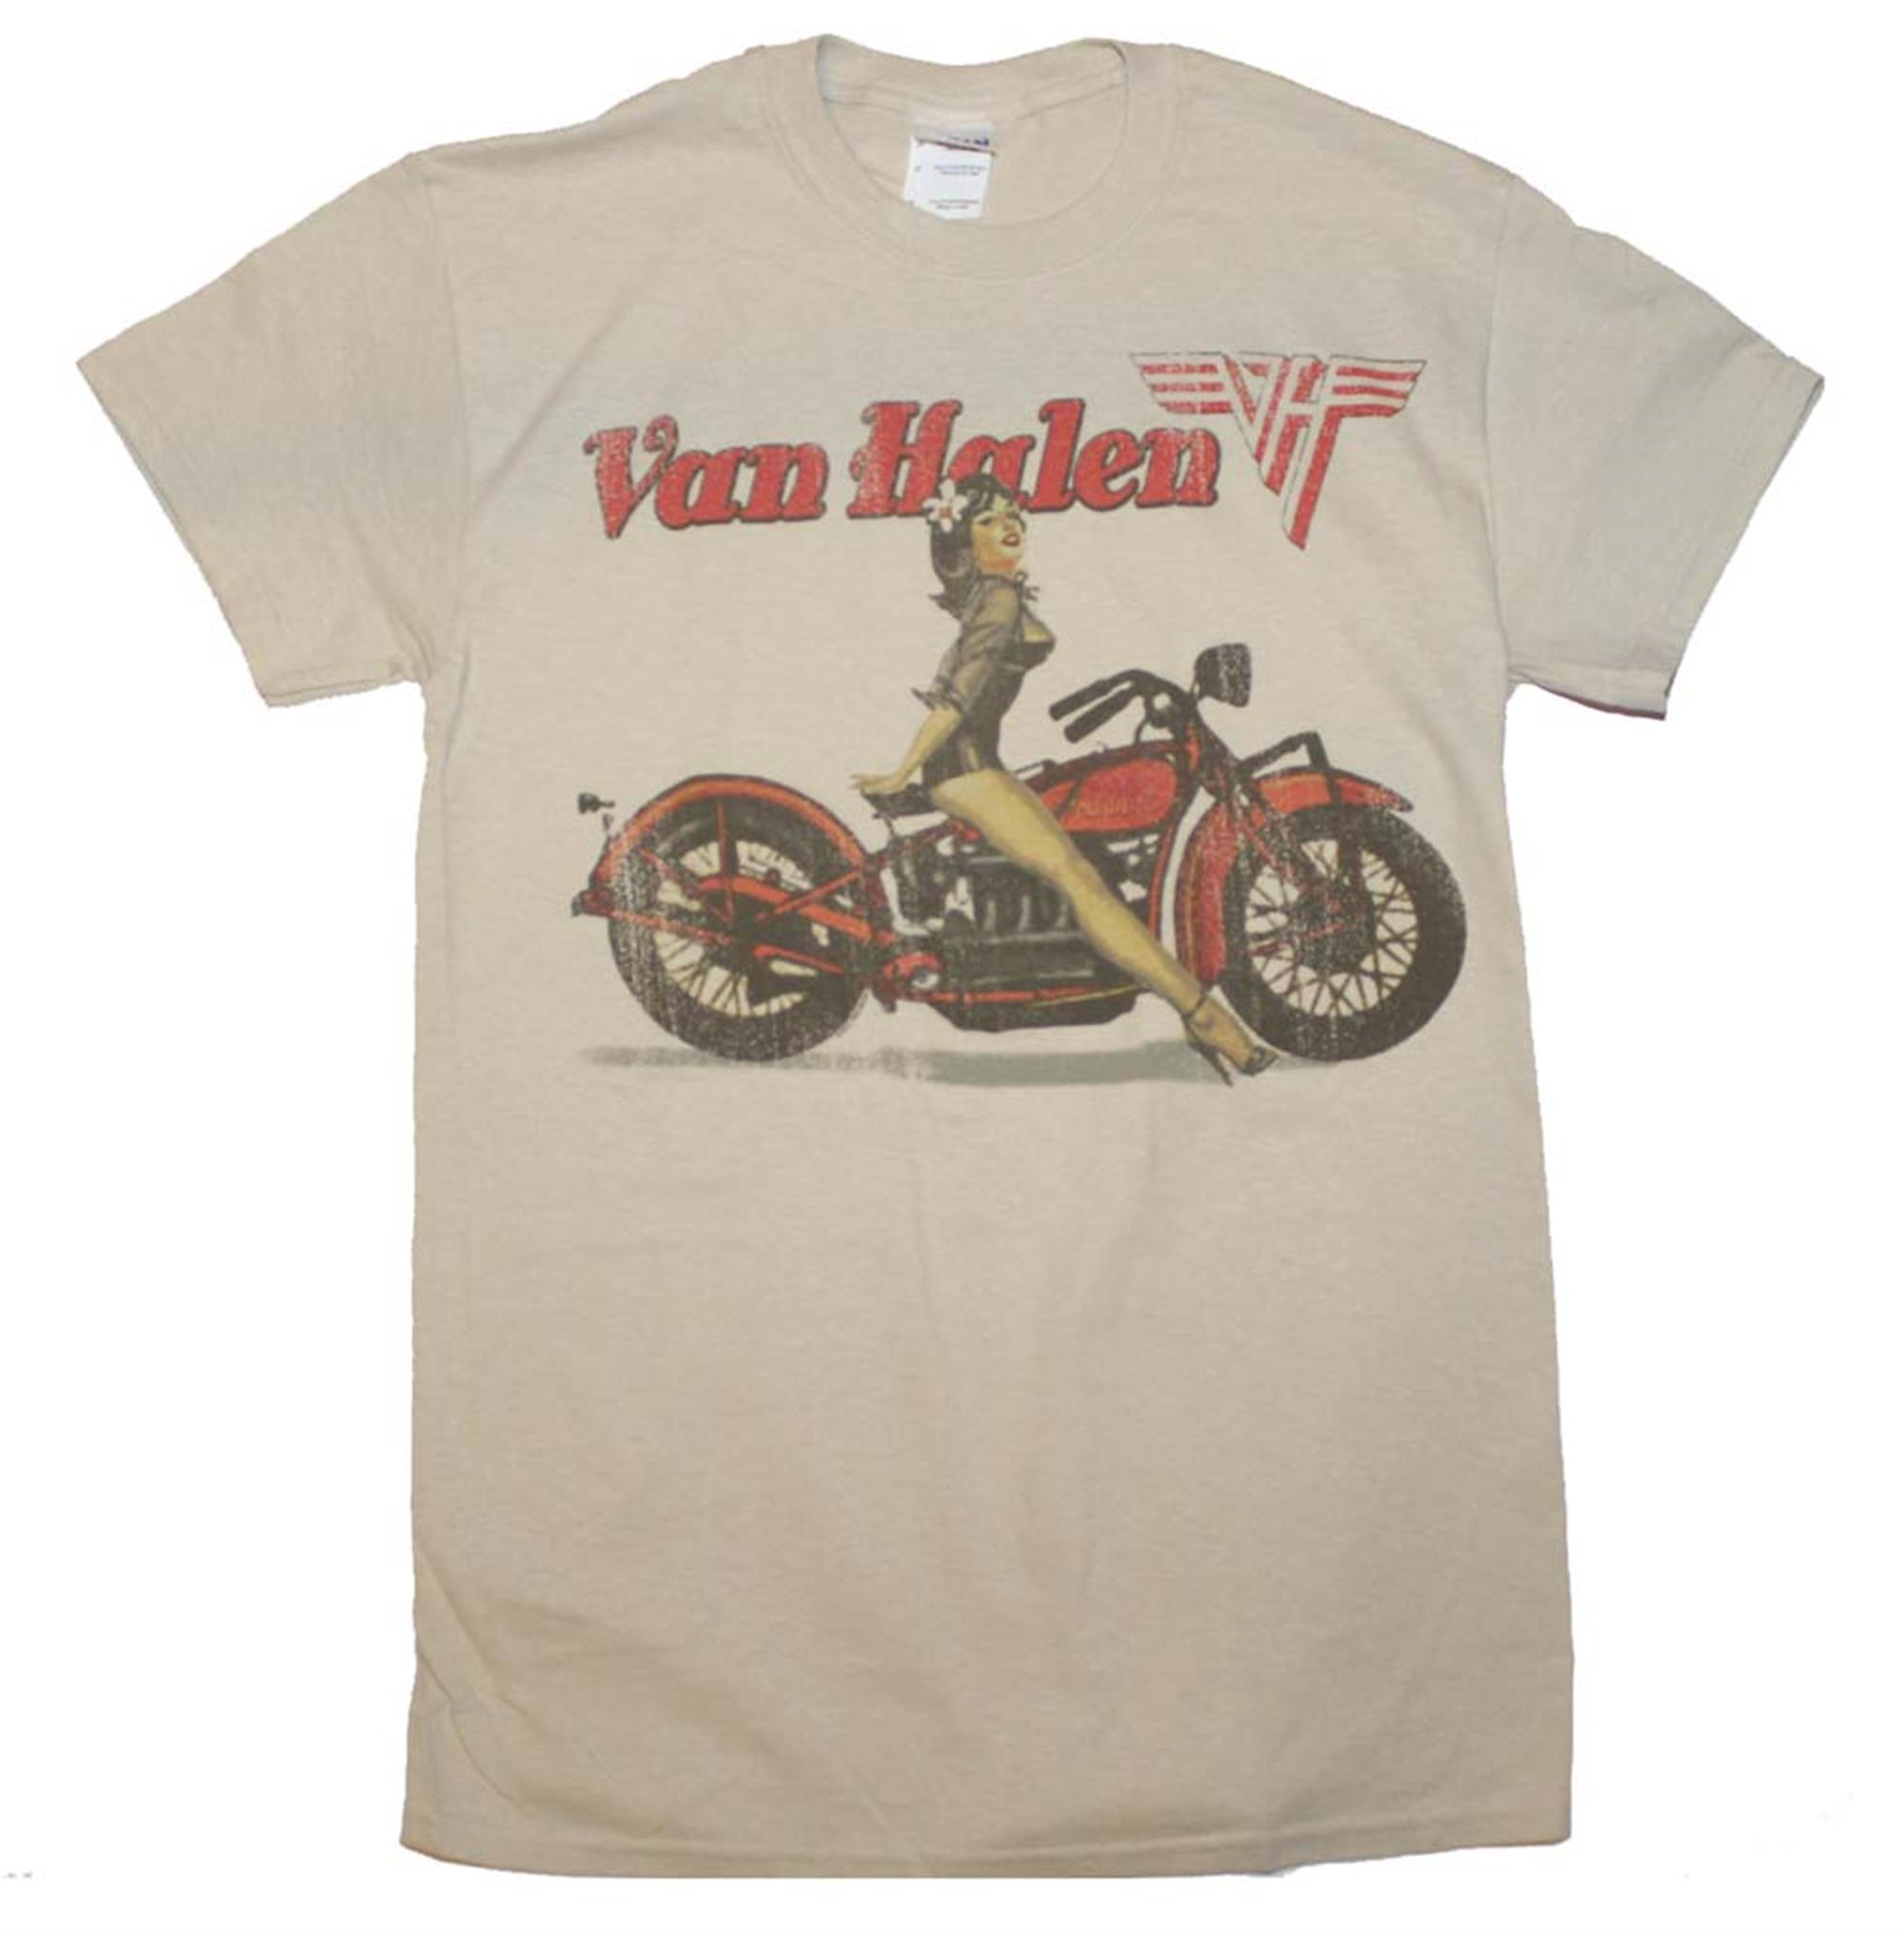 Van Halen Biker Pin Up T-Shirt